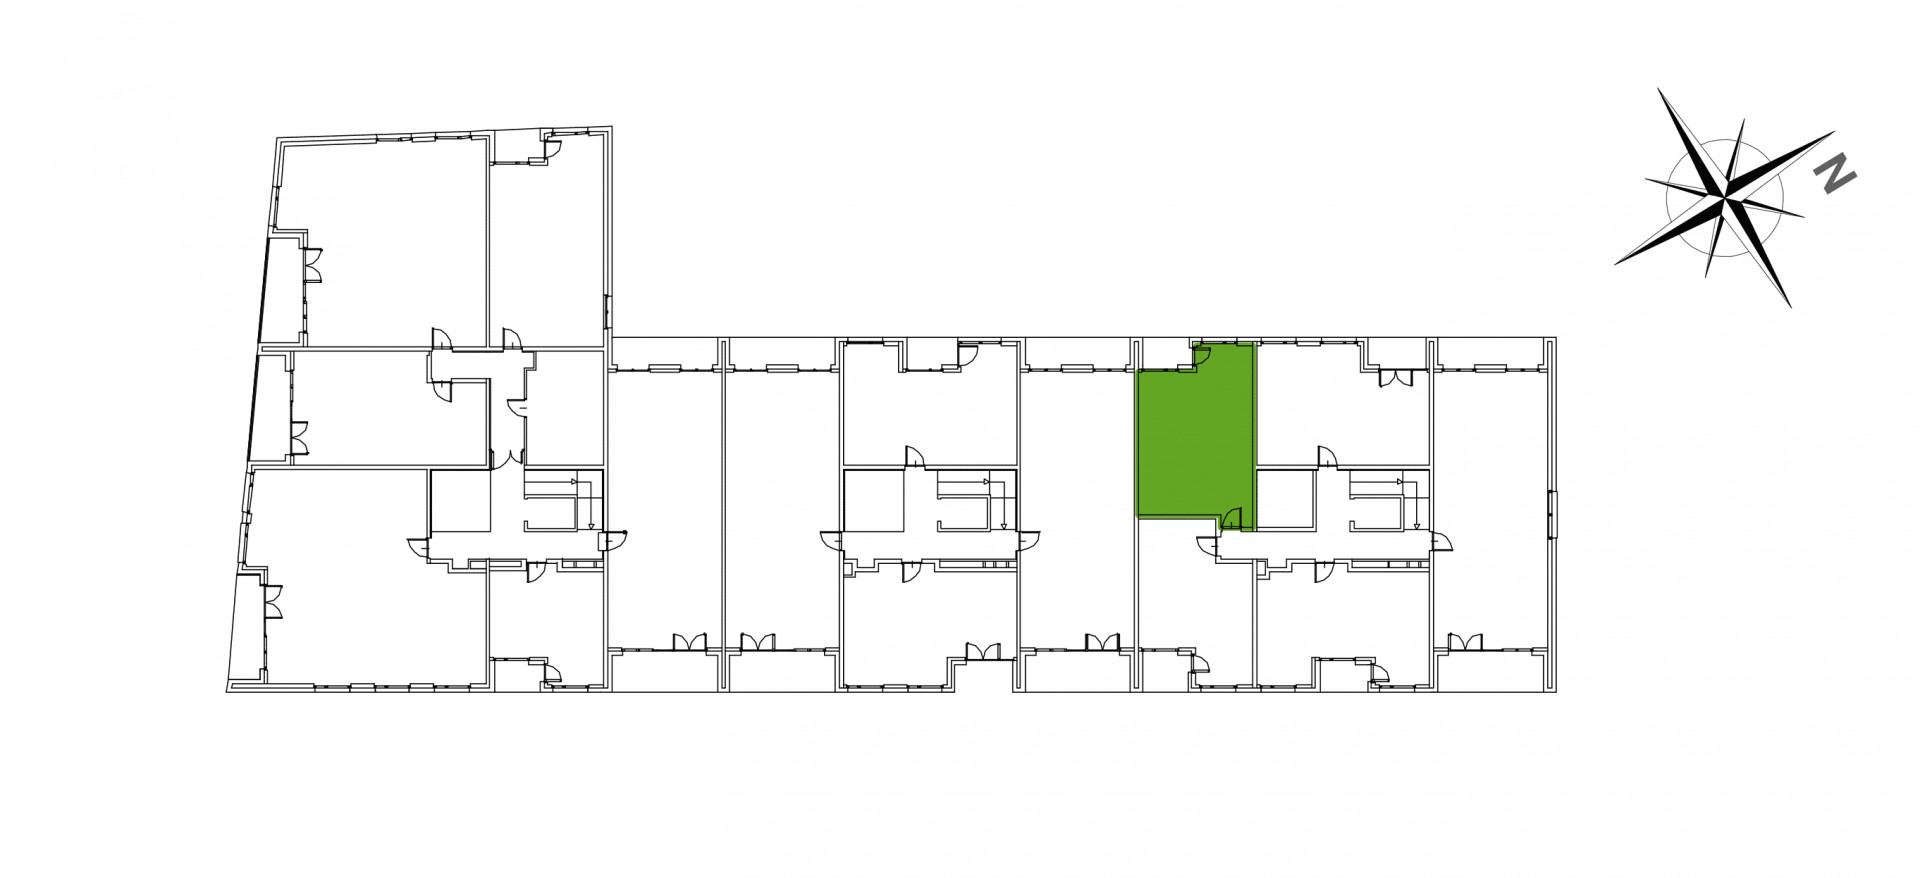 Mazowiecka 72 / apartament nr 7 rzut 2